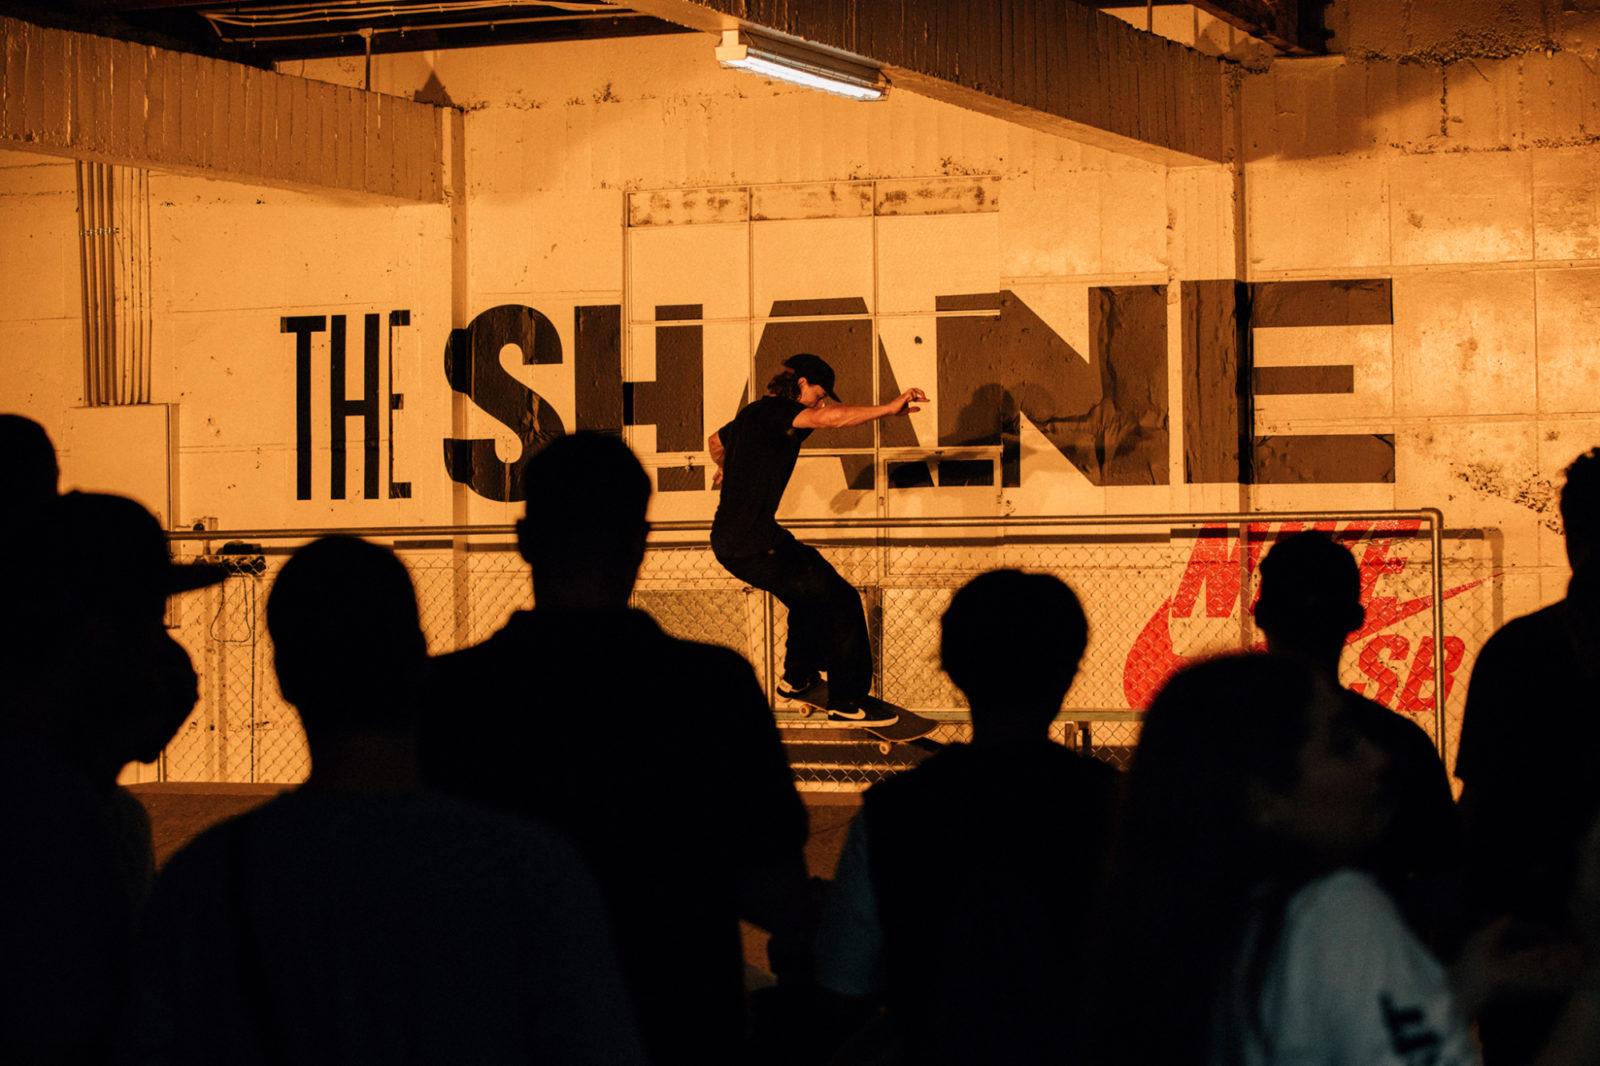 Web space between nike sb the shane 65